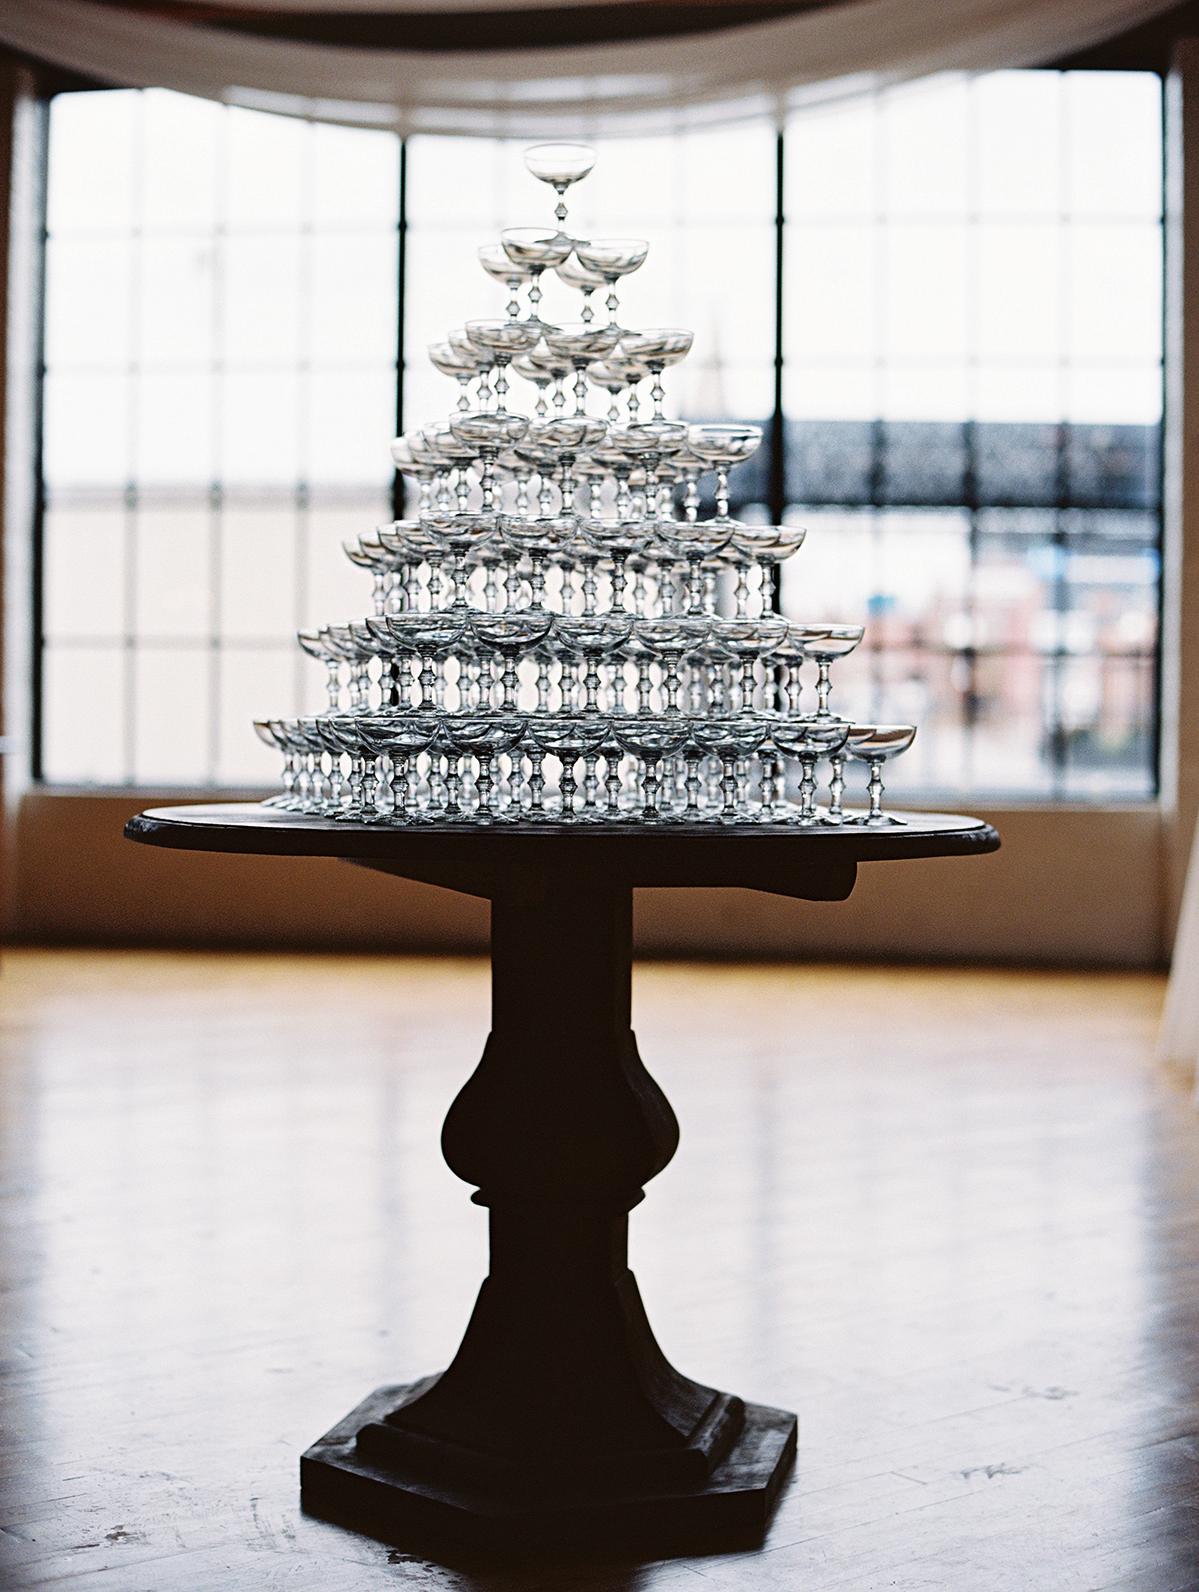 joanna jay wedding champagne tower